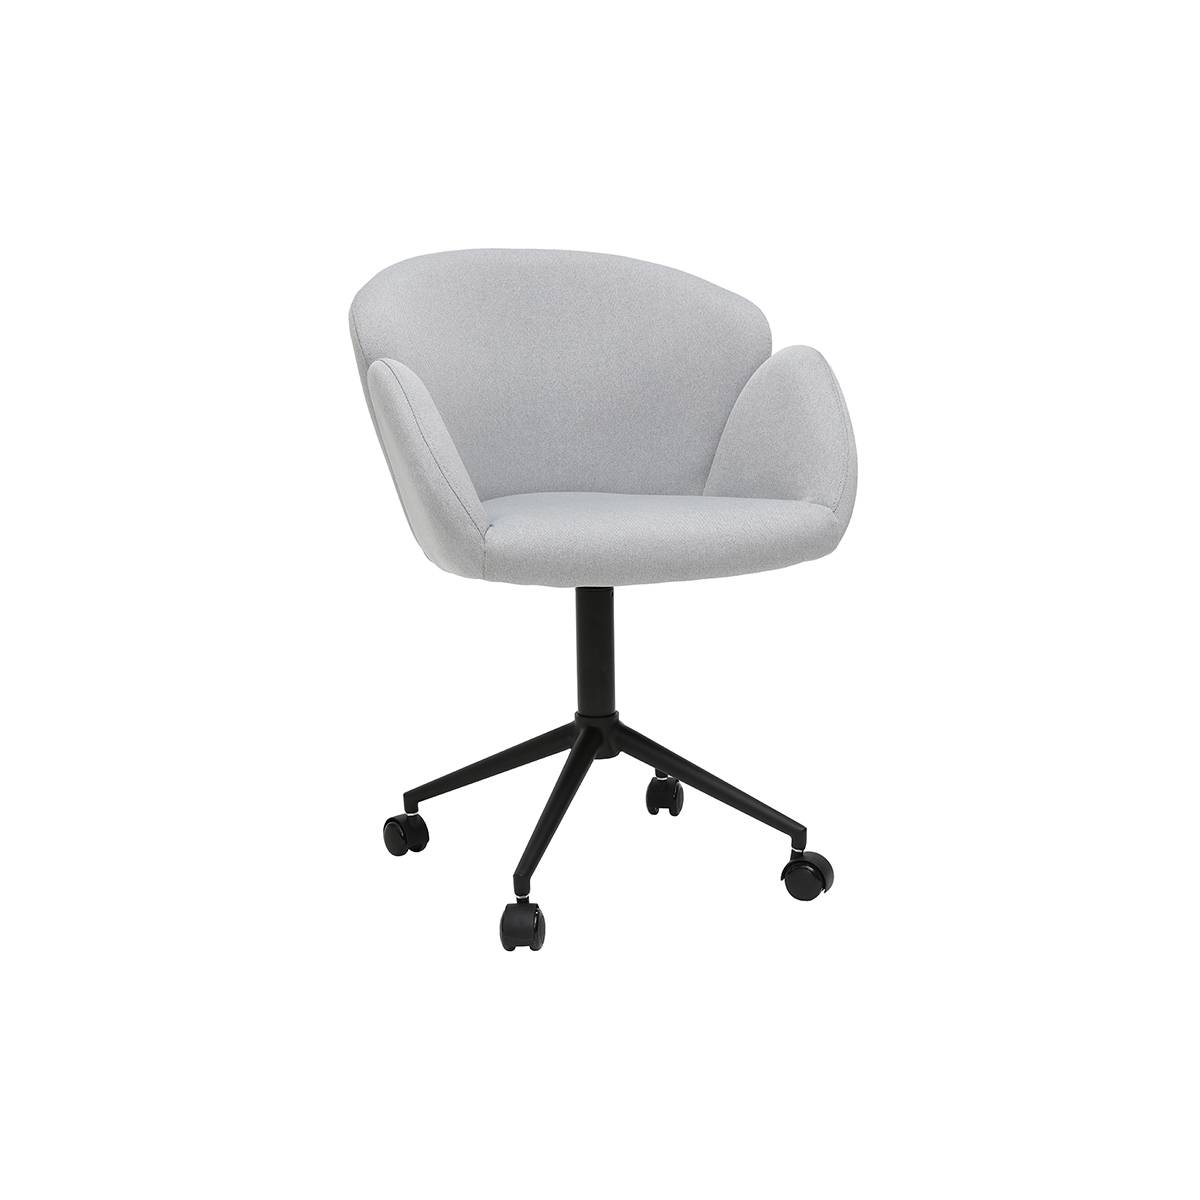 Miliboo Fauteuil de bureau design en tissu gris clair RHAPSODY - Miliboo & Stéphane Plaza